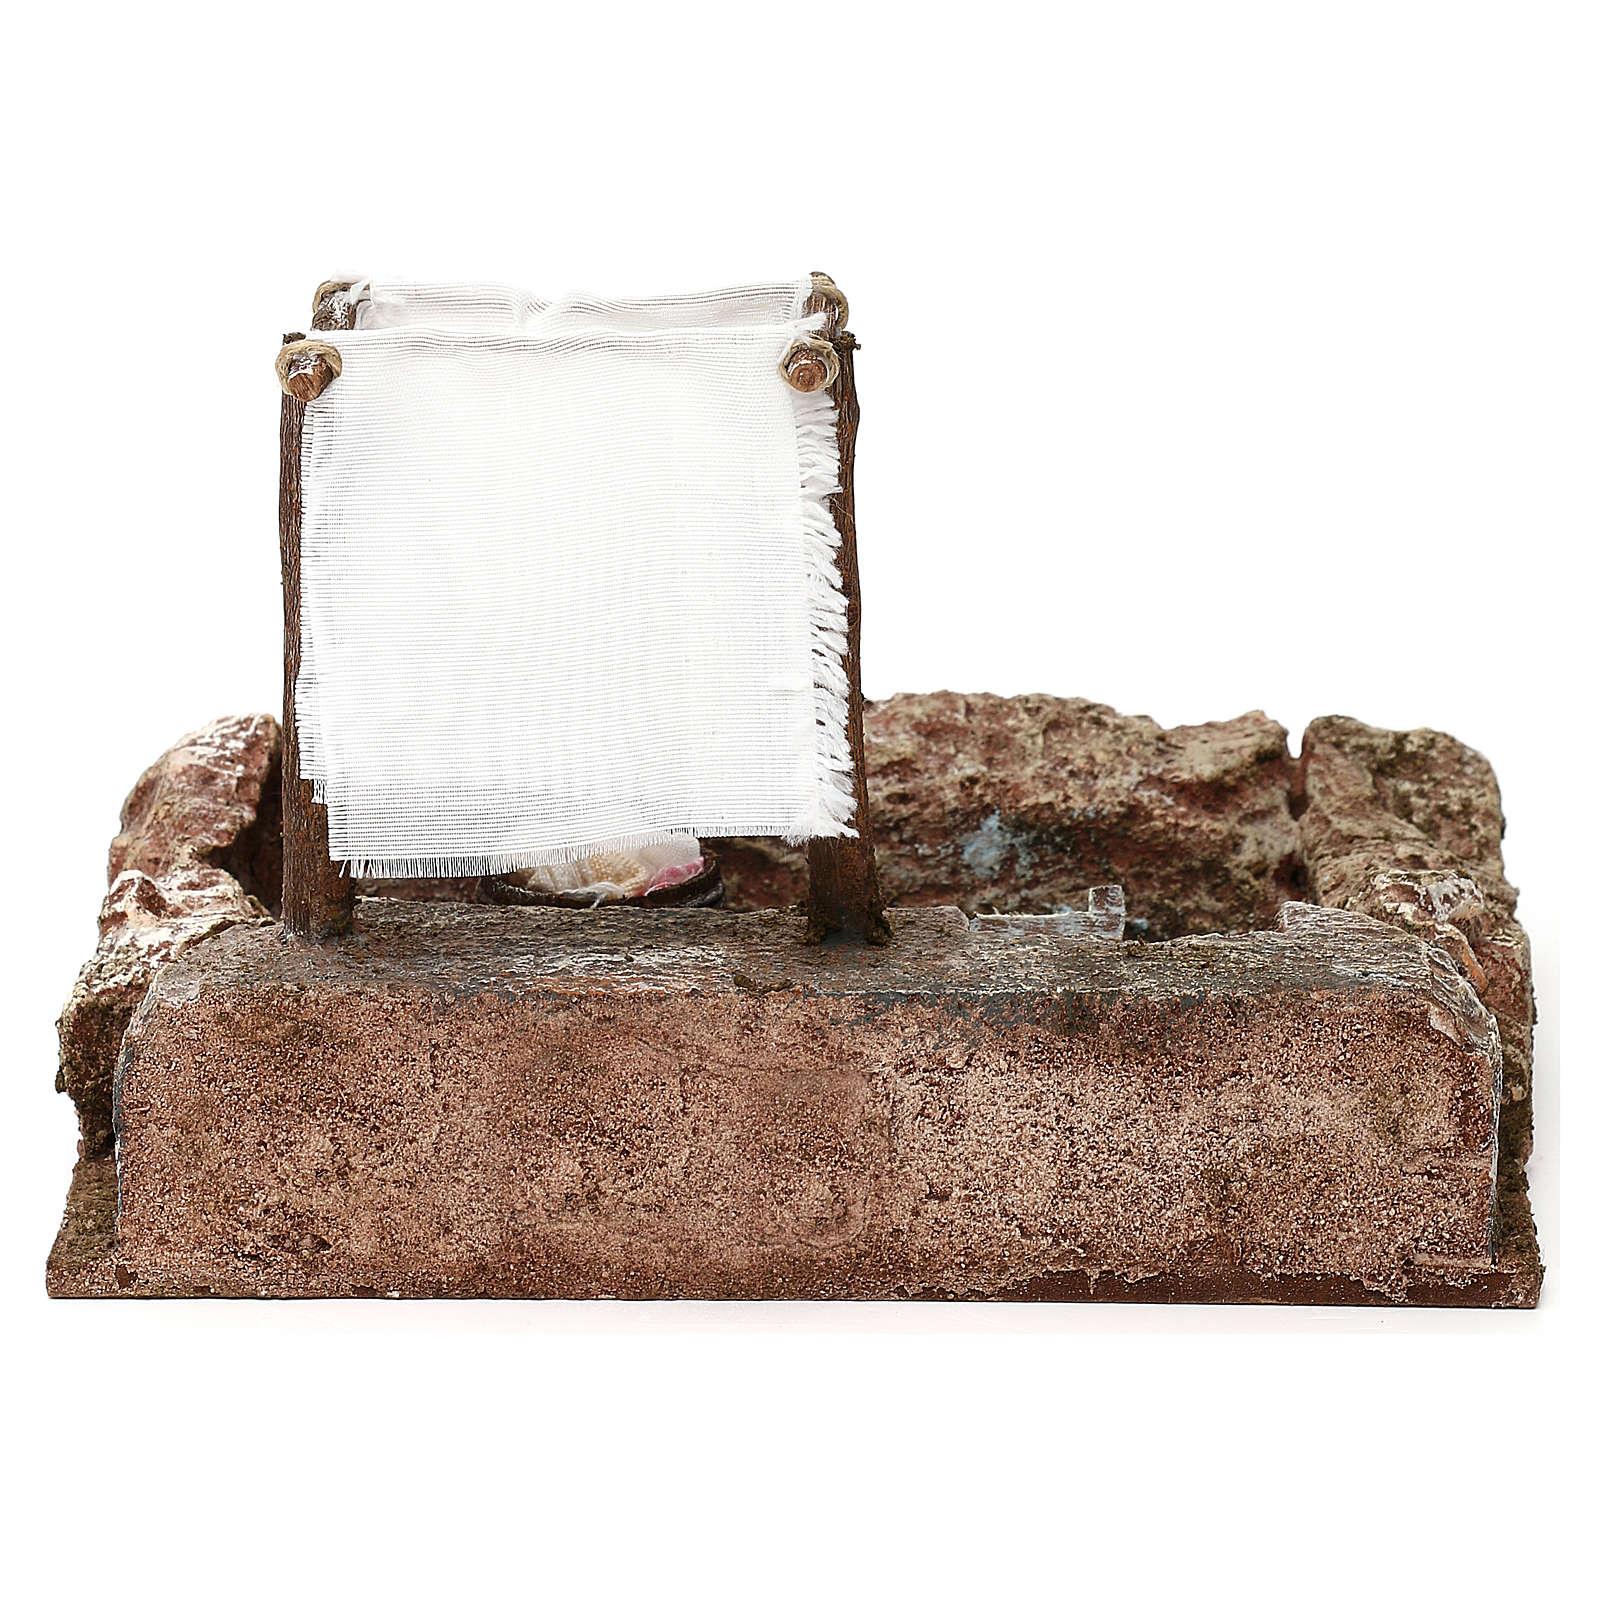 Lavanderia sul fiume presepe 10 cm ambientazione 15x20x15 cm 4